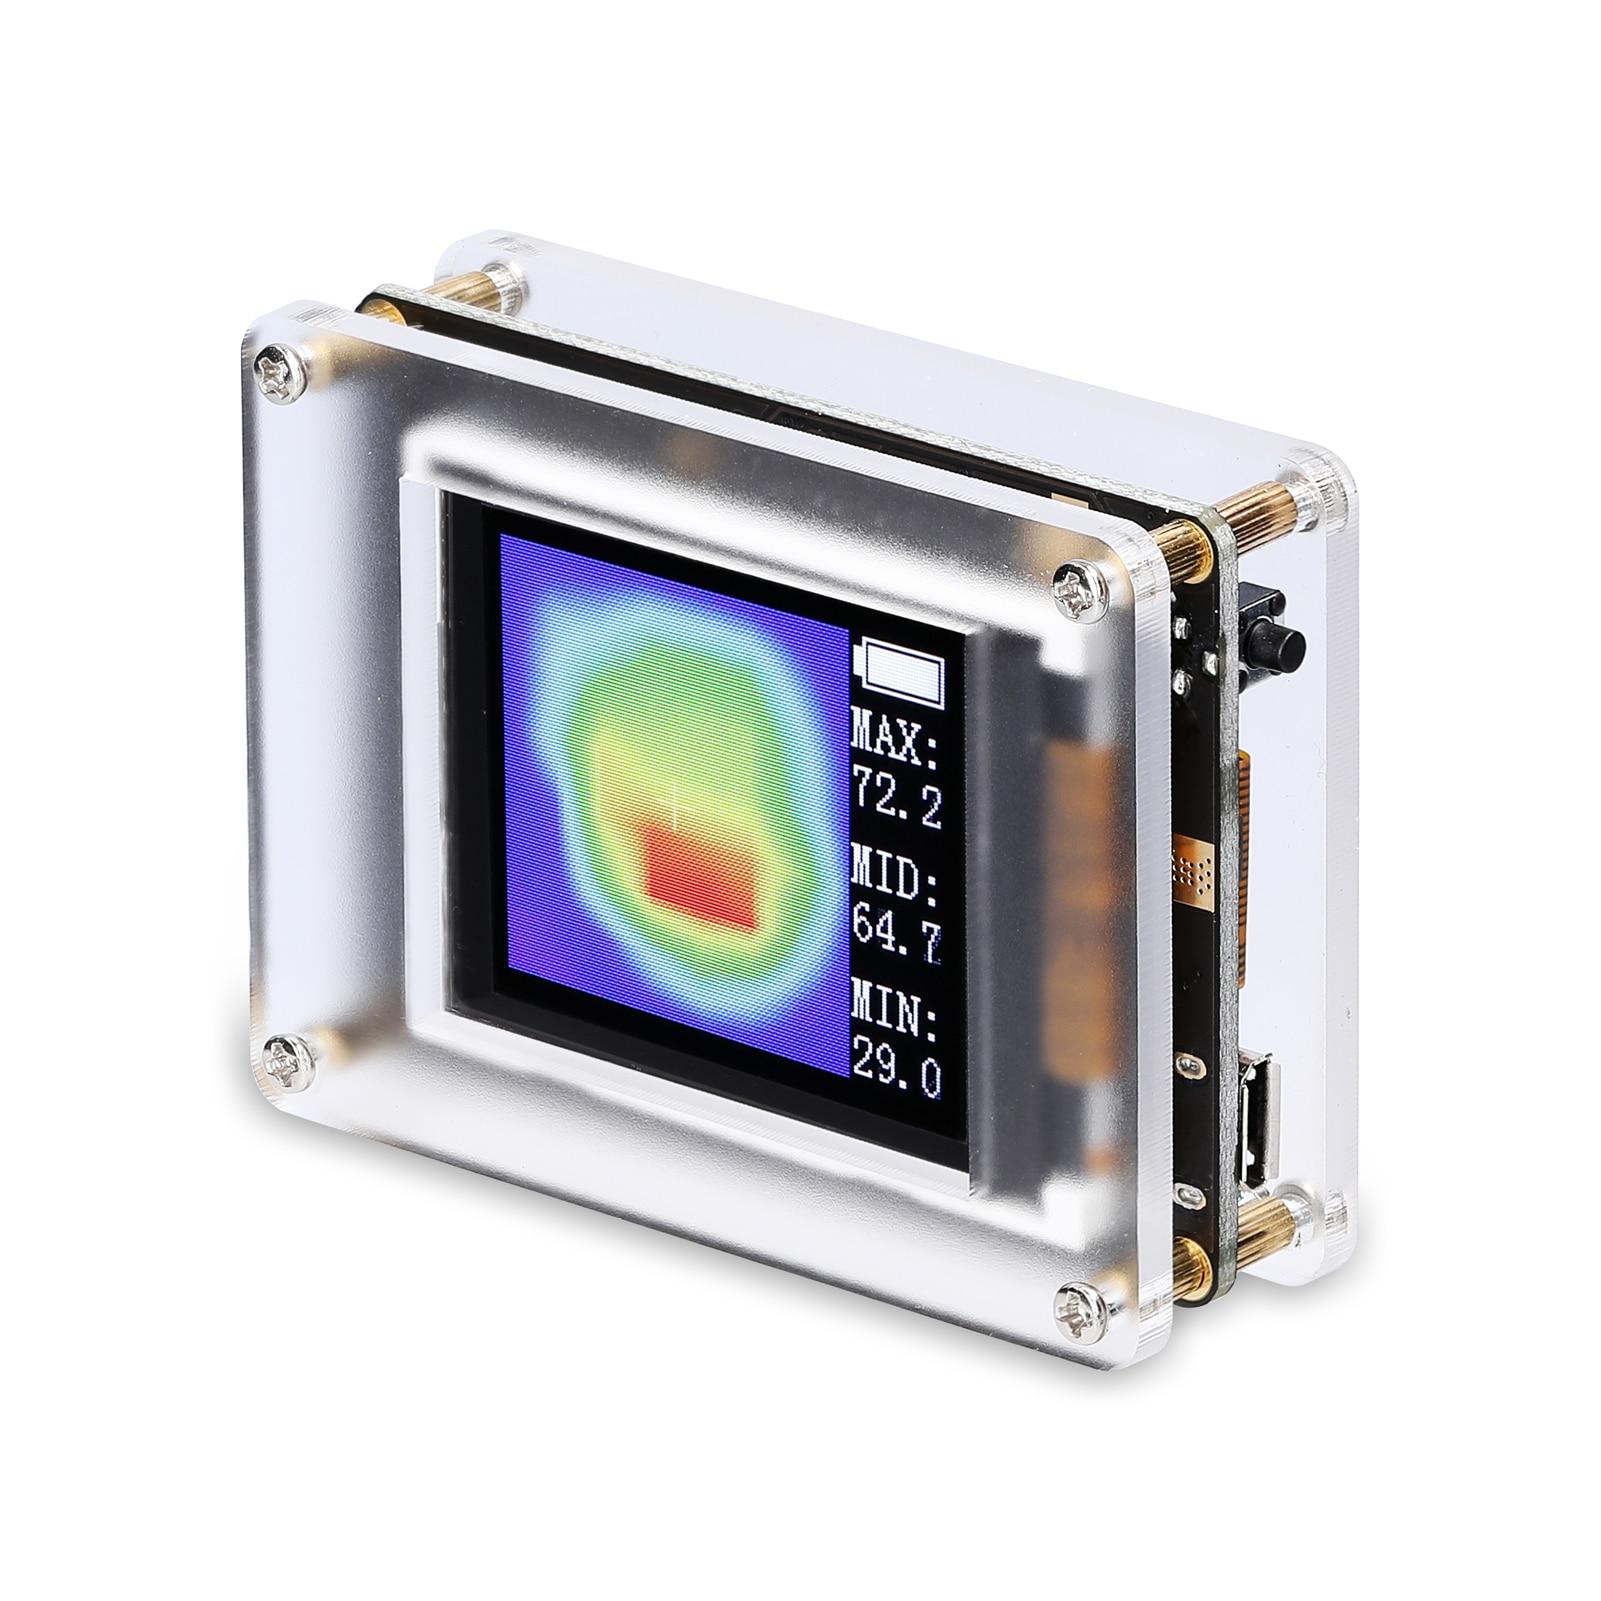 AMG8833_CP 1.8 بوصة TFT عرض بسيط جهاز محمول بالأشعة تحت الحمراء الحرارية تصوير مجسات حرارة الحد الأدنى لدرجة الحرارة العرض